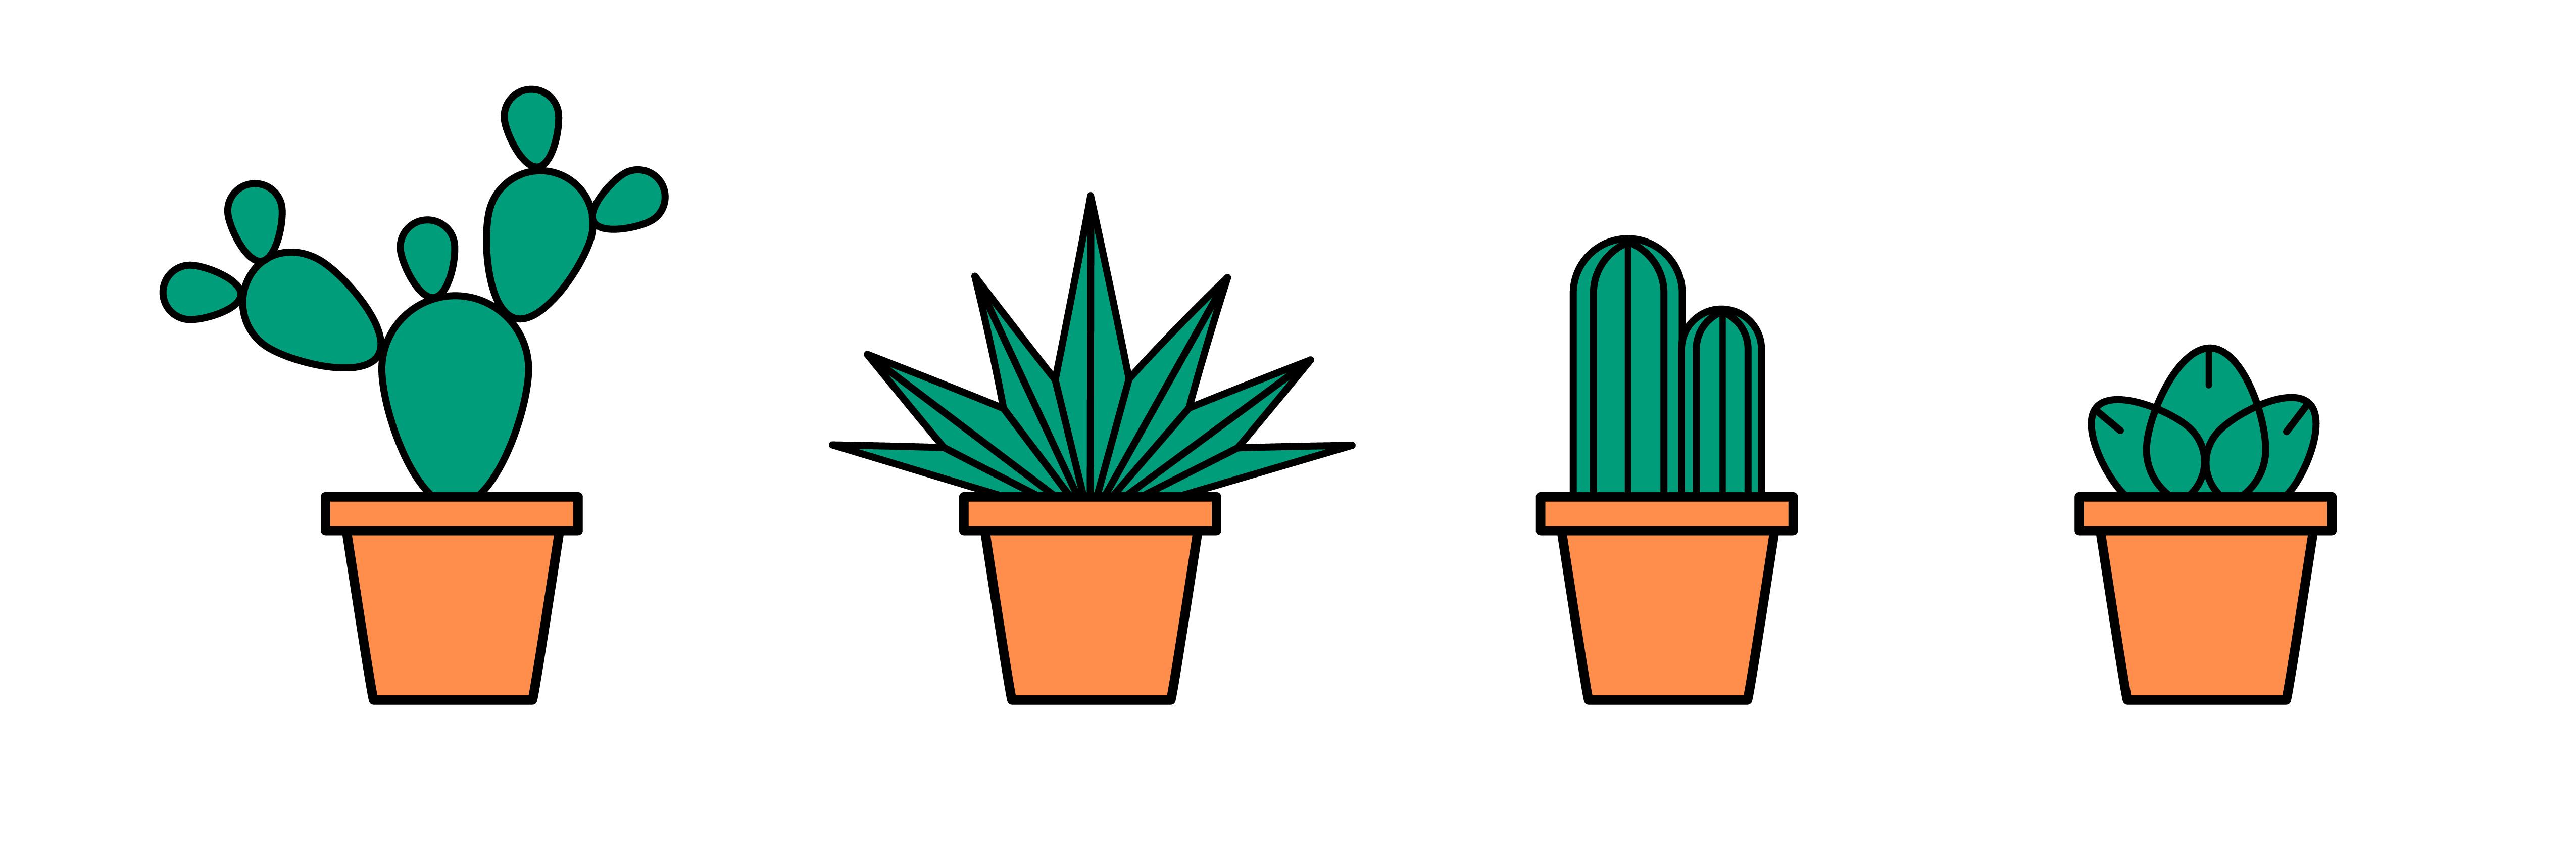 plants_-10-10